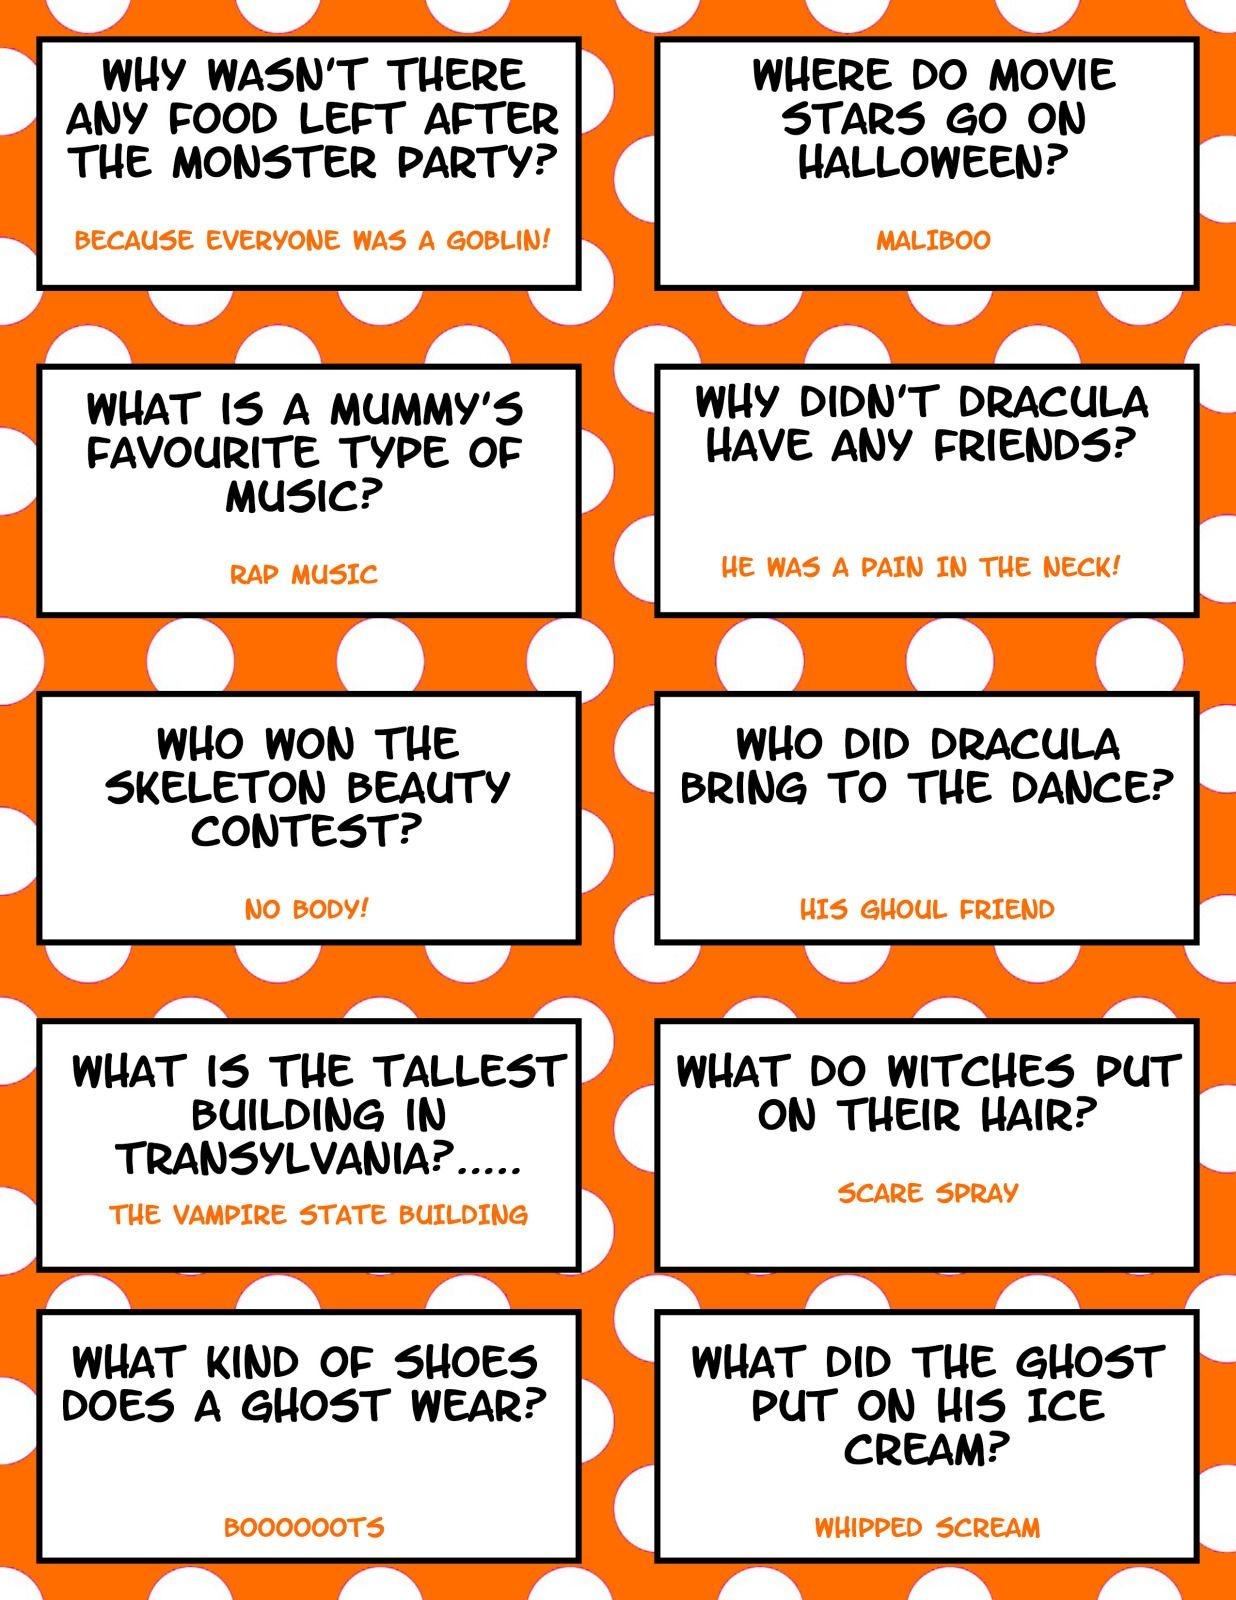 21 Hilarious Halloween Lunch Box Jokes For Kids | Books For Jordan - Free Printable Jokes For Adults